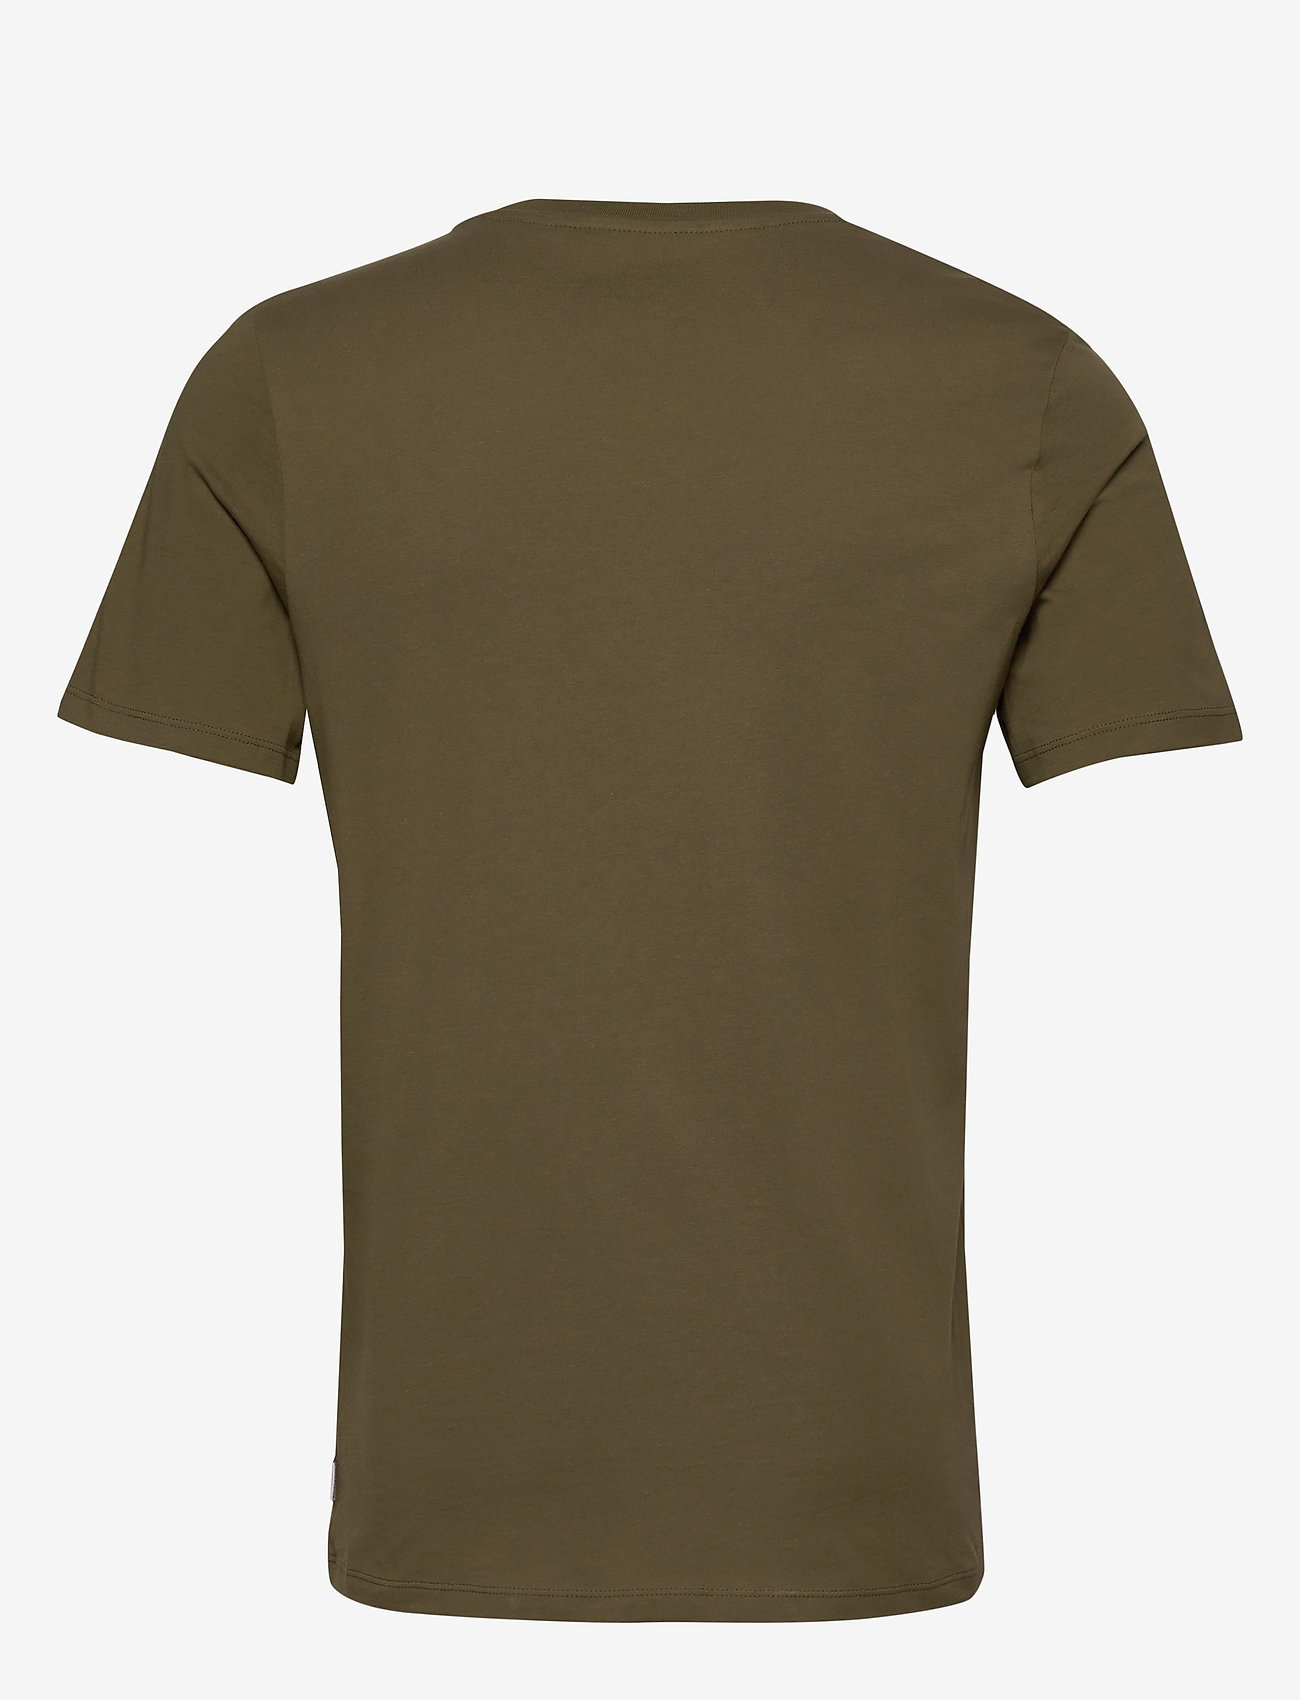 Jack & Jones - JJEPOCKET TEE SS O-NECK NOOS - basic t-shirts - olive night - 1